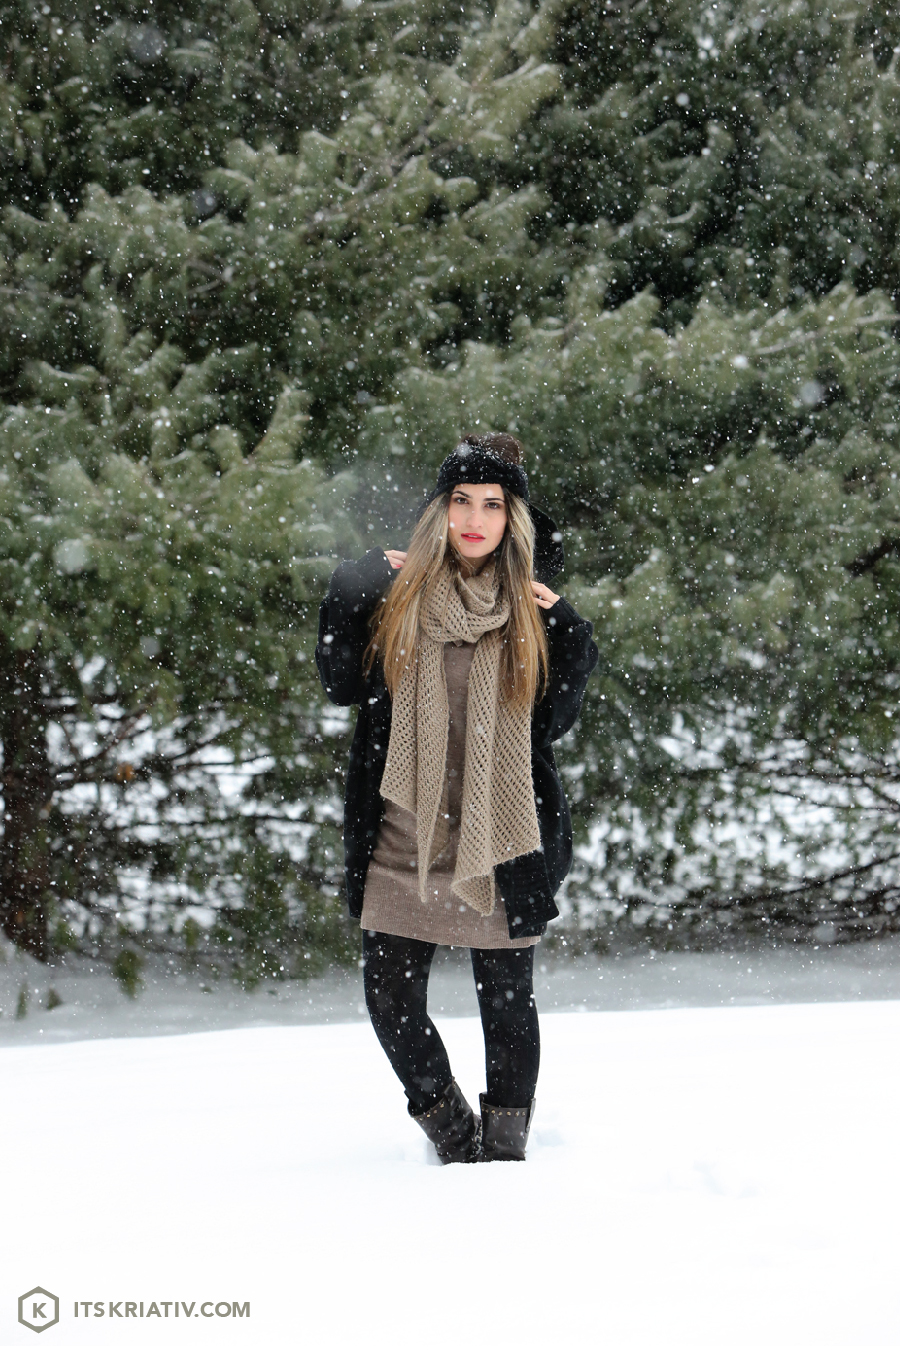 Its-Kriativ-Fashion-Let-It-Snow-Winter-02.jpg